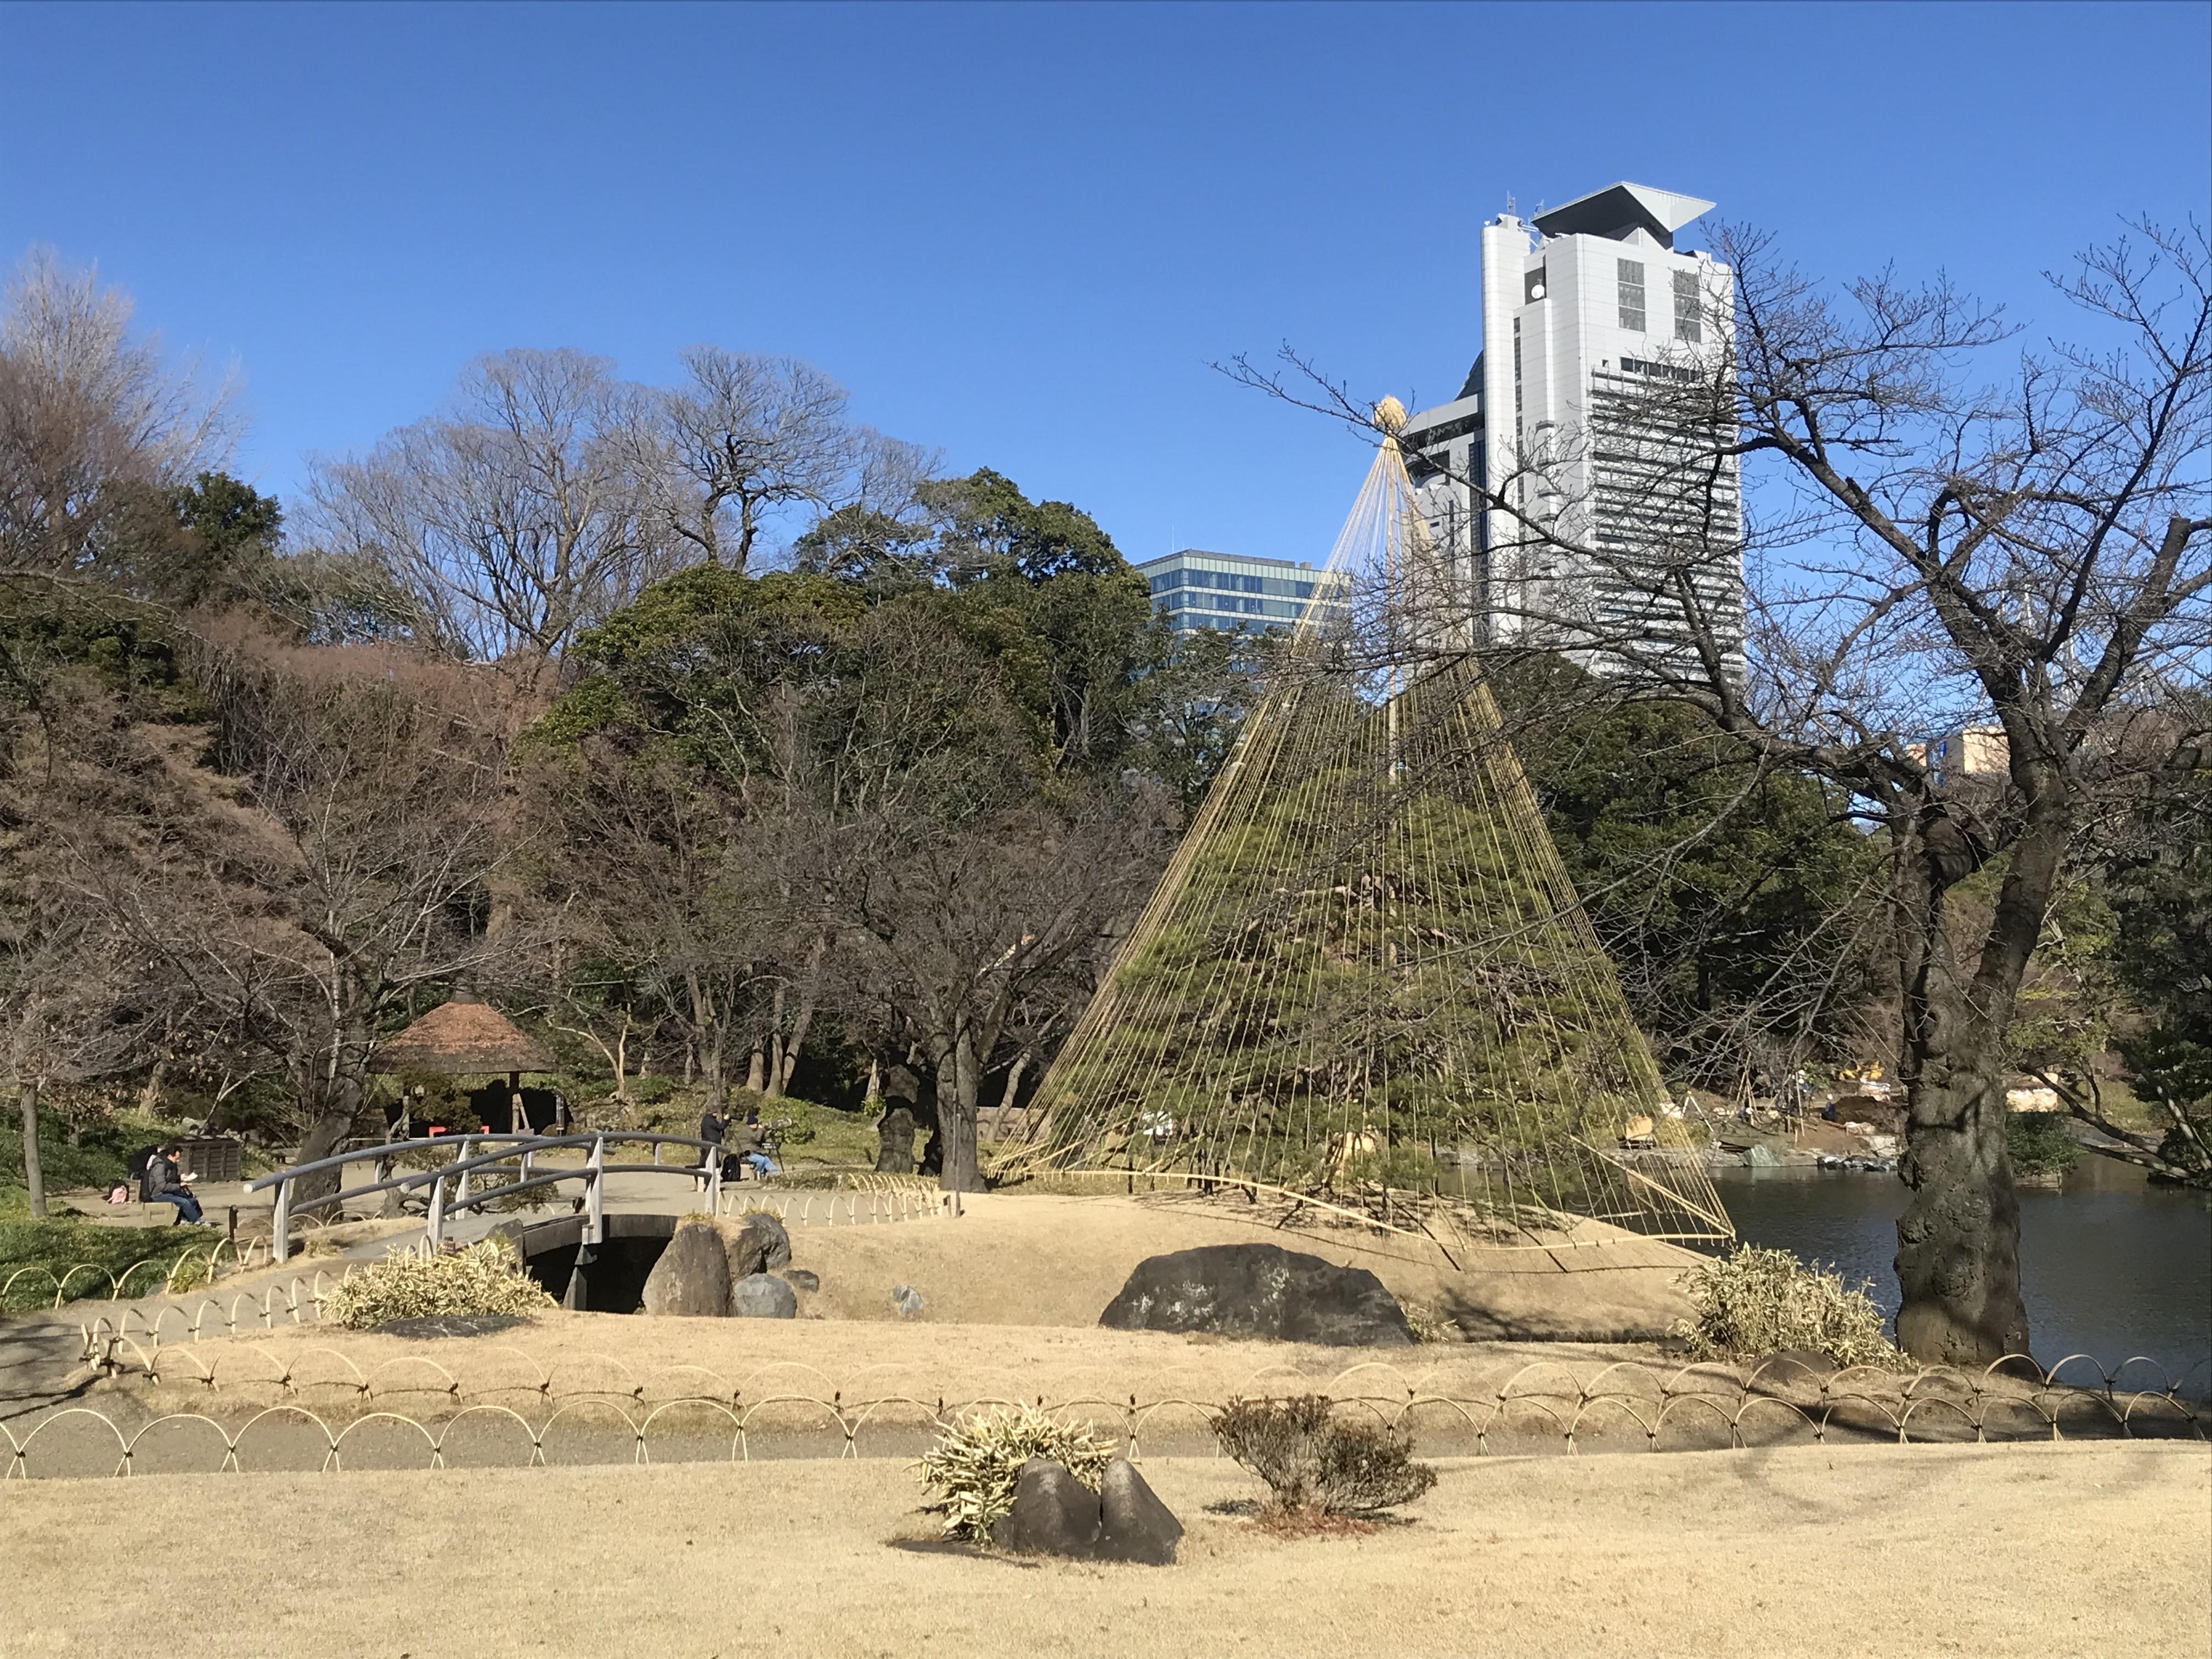 A pine tree decorated for winter scenery in Koishikawa Korakuen